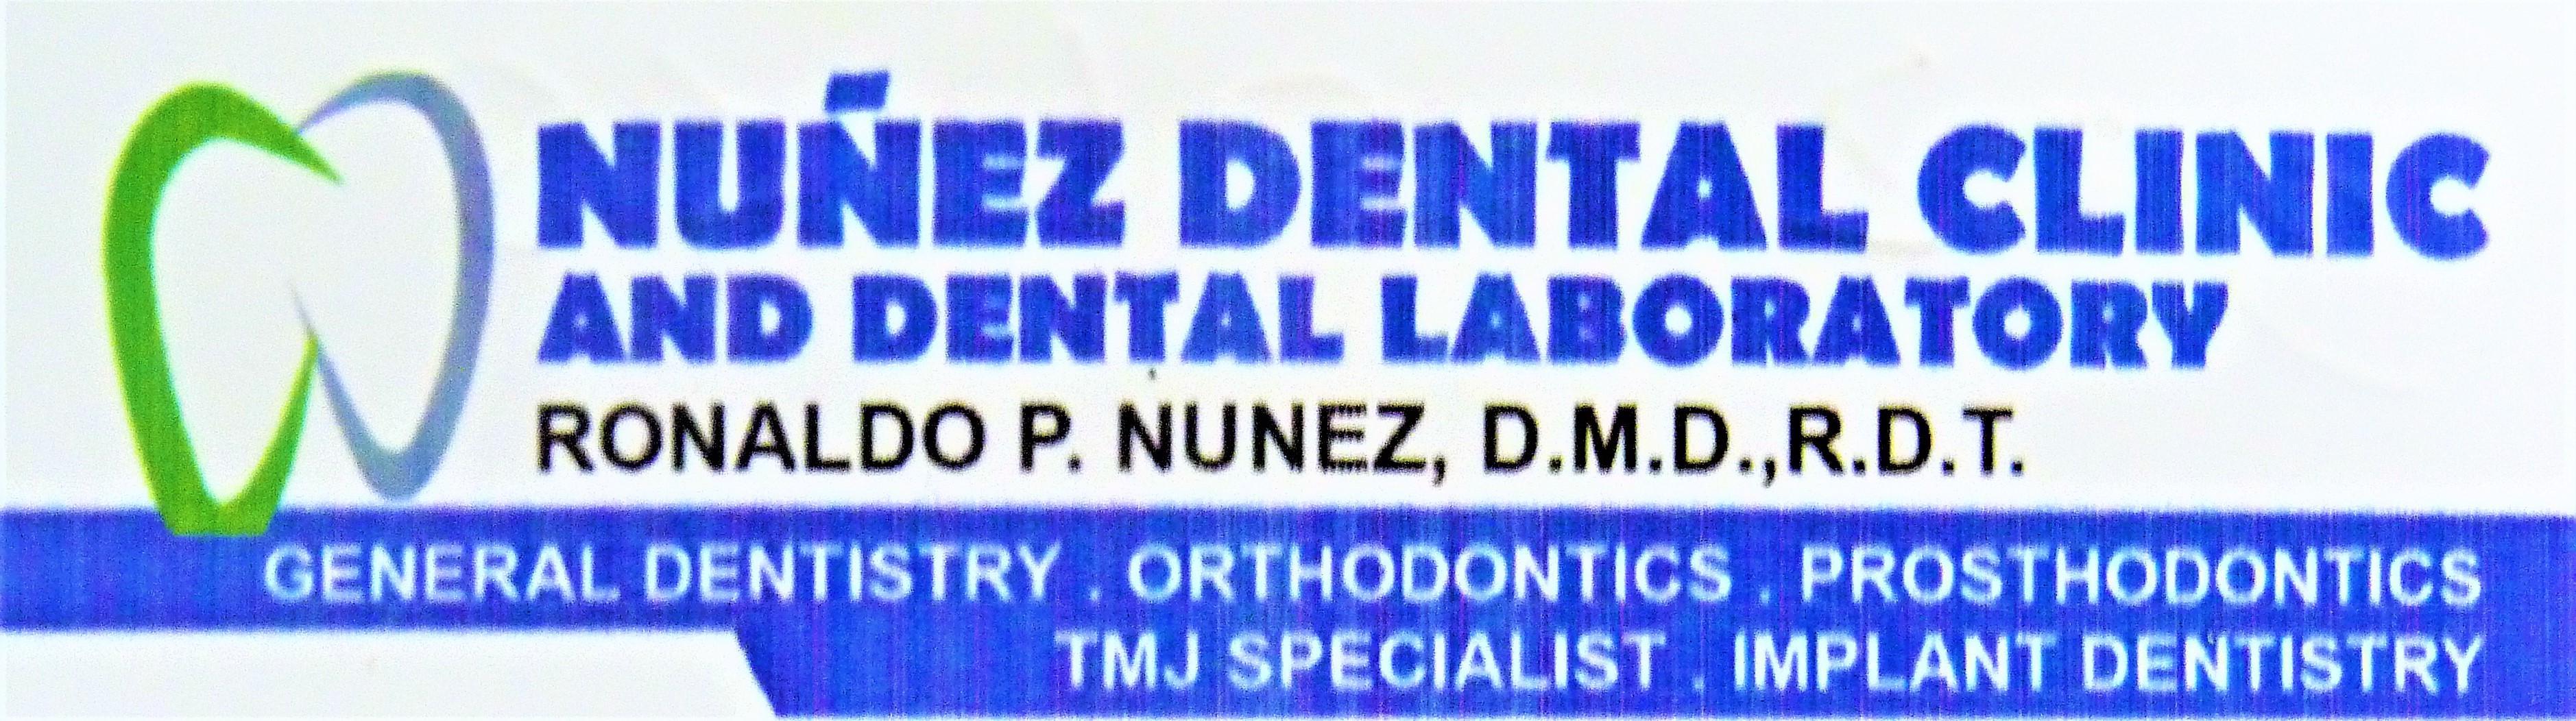 Nunez Dental Clinic